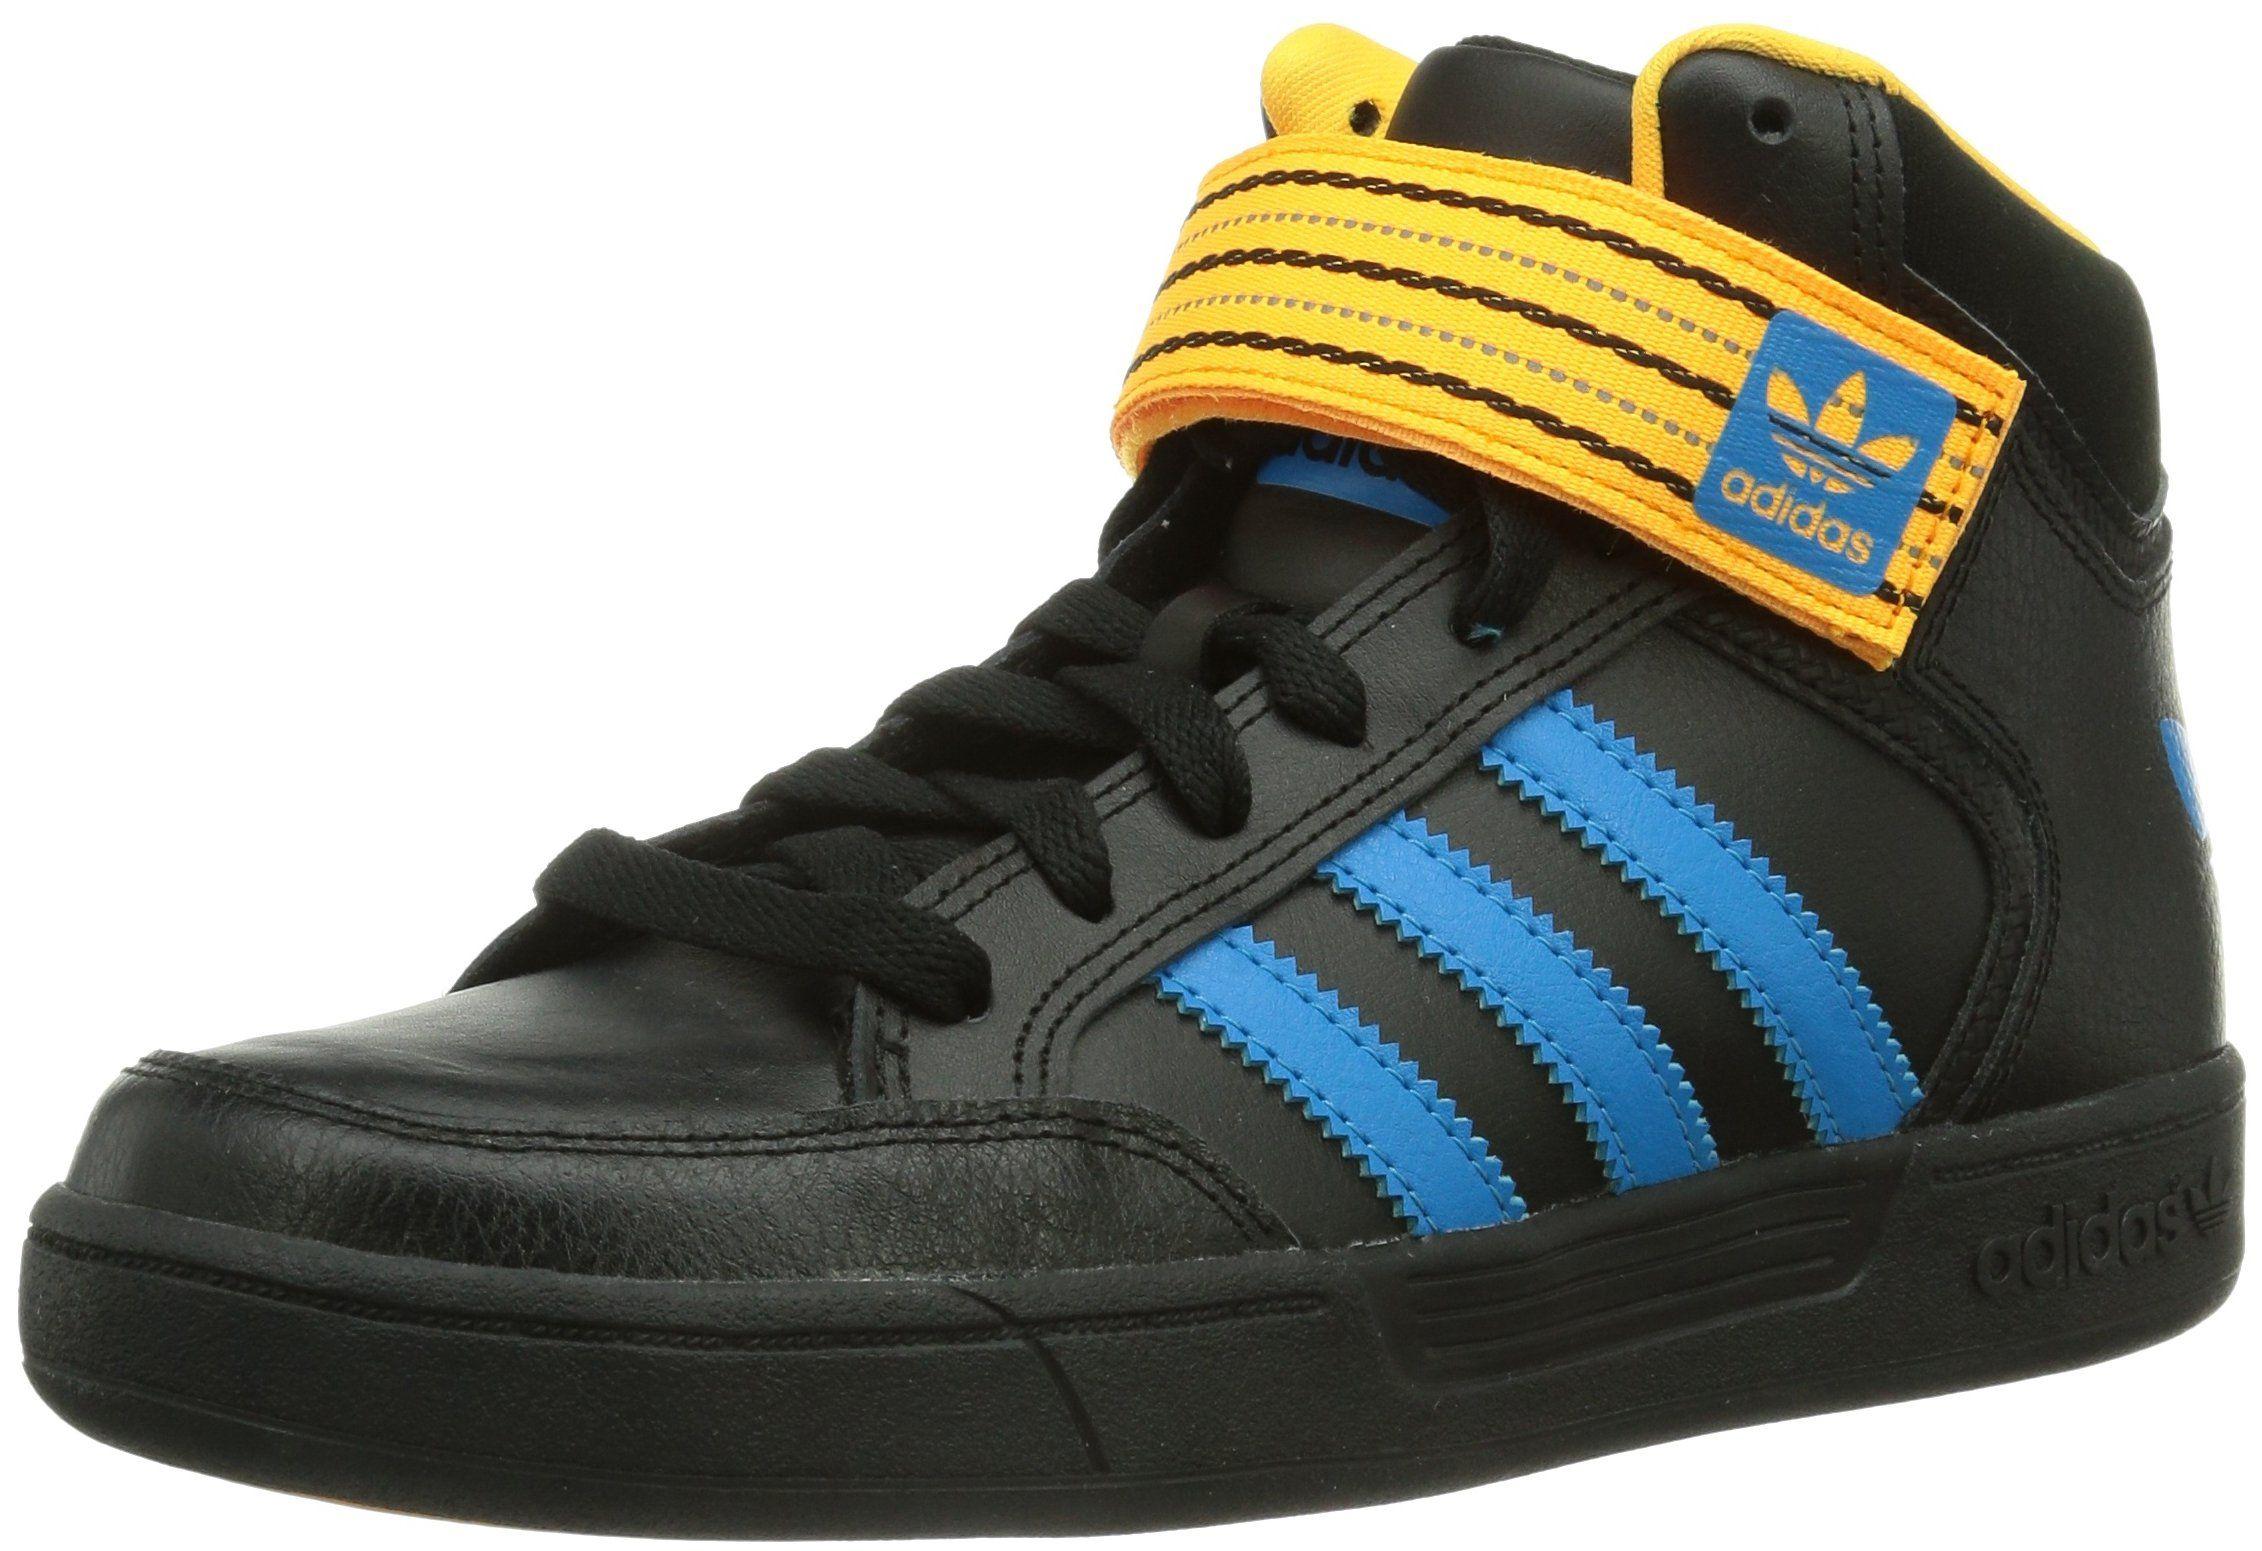 adidas Varial Mid, Unisex-Erwachsene Hohe Sneakers: adidas Originals:  Amazon.de